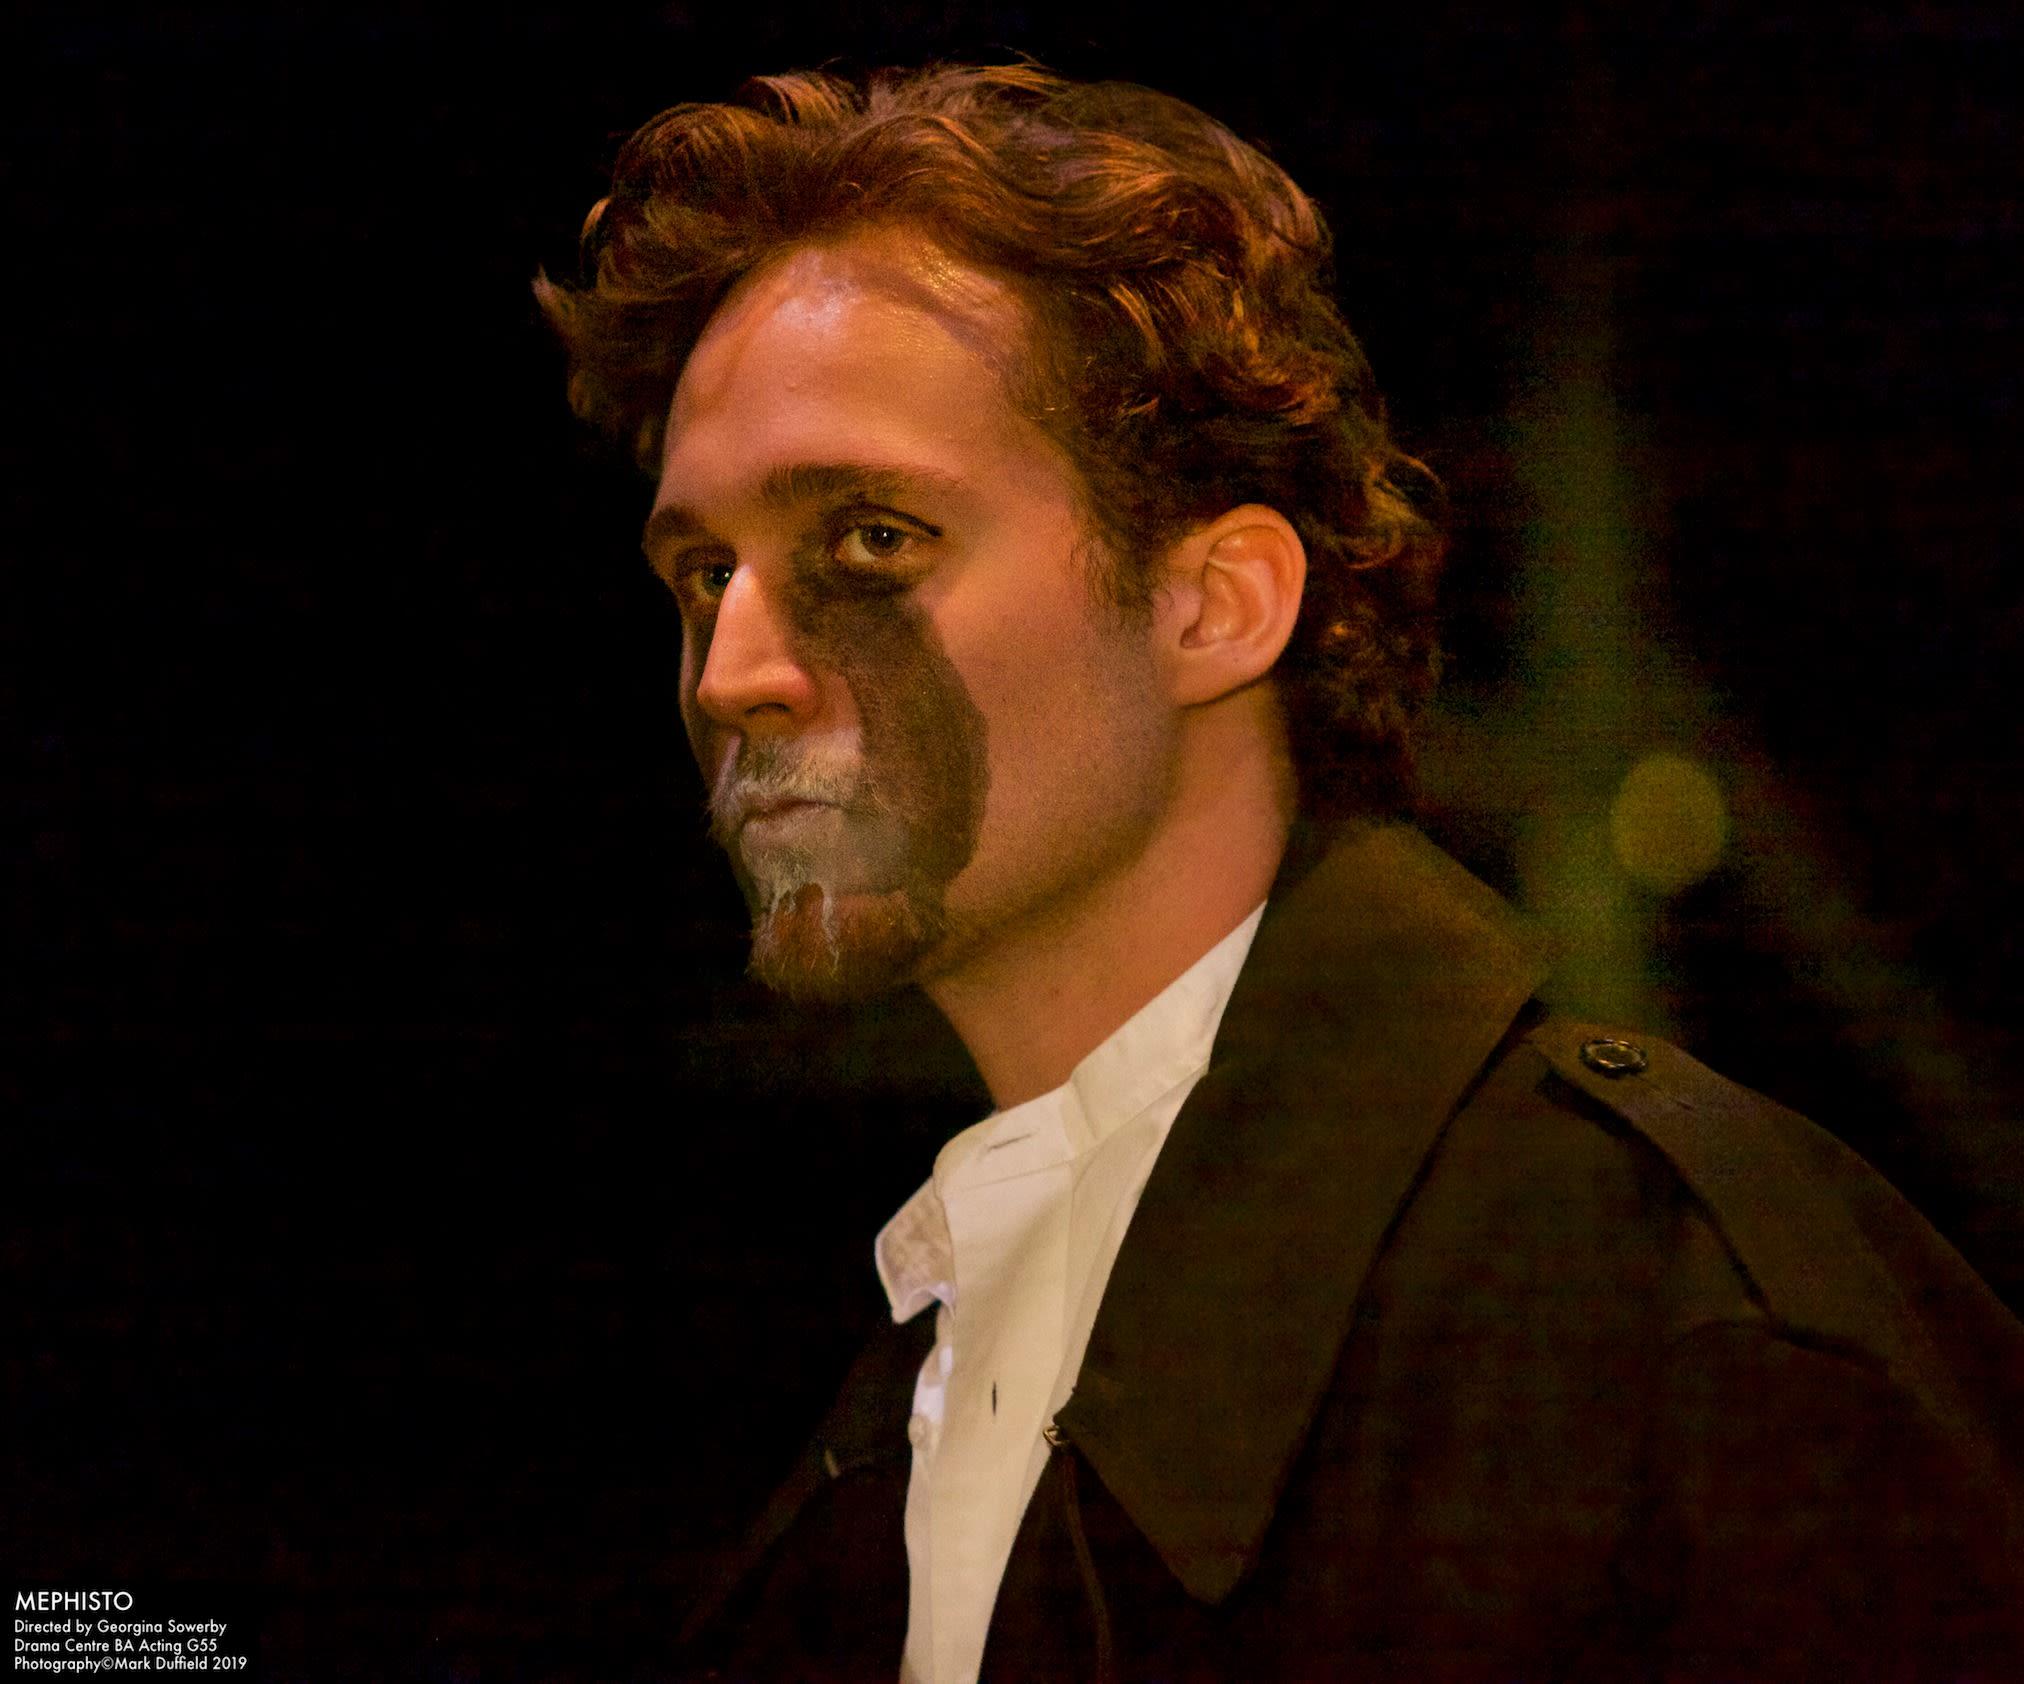 Mephisto-Jack-Carroll-photo-Mark-Duffield.jpg